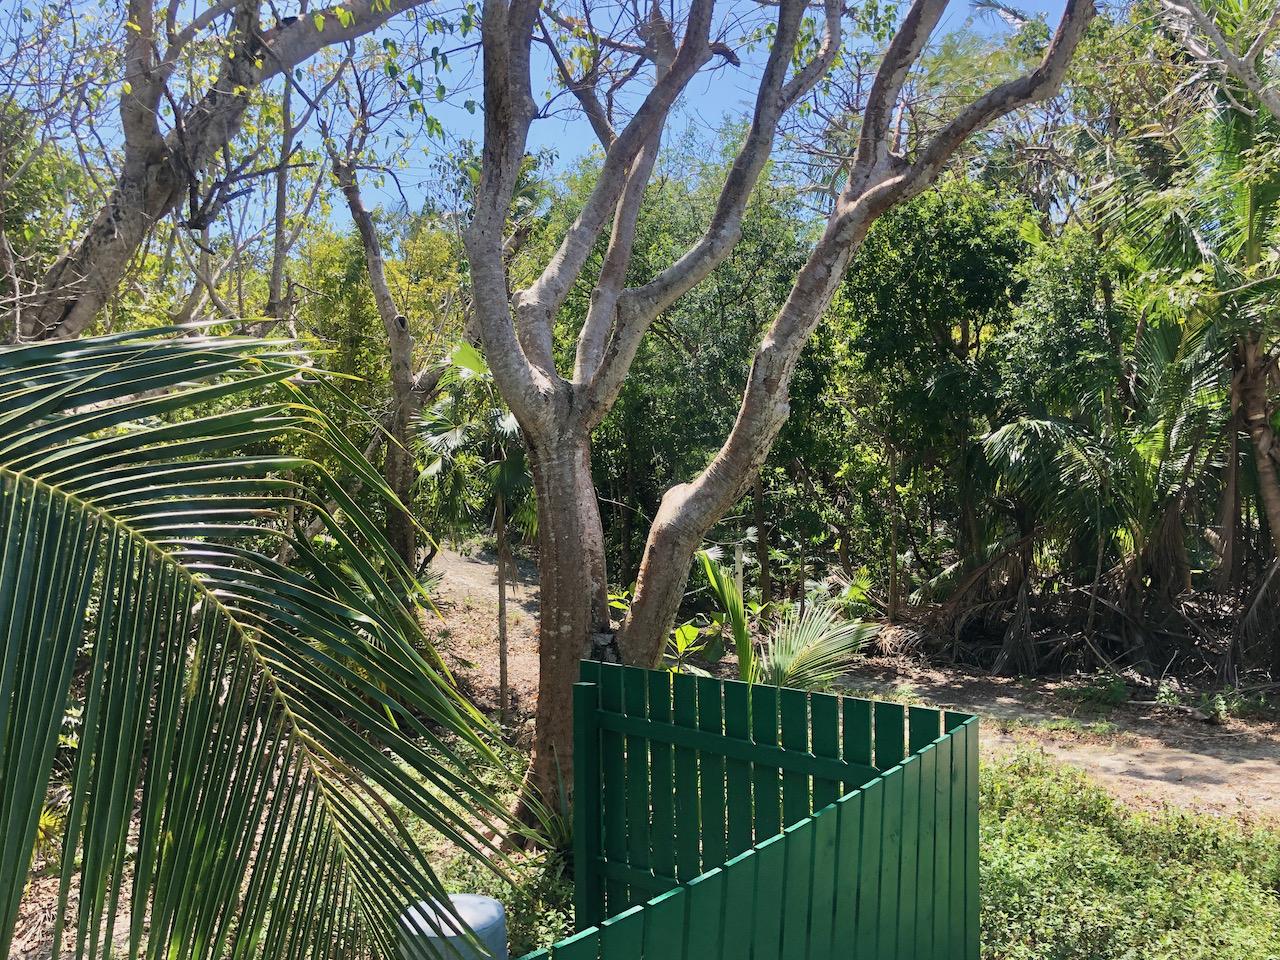 bahama-palm-shores-beachfront-home-for-sale-13